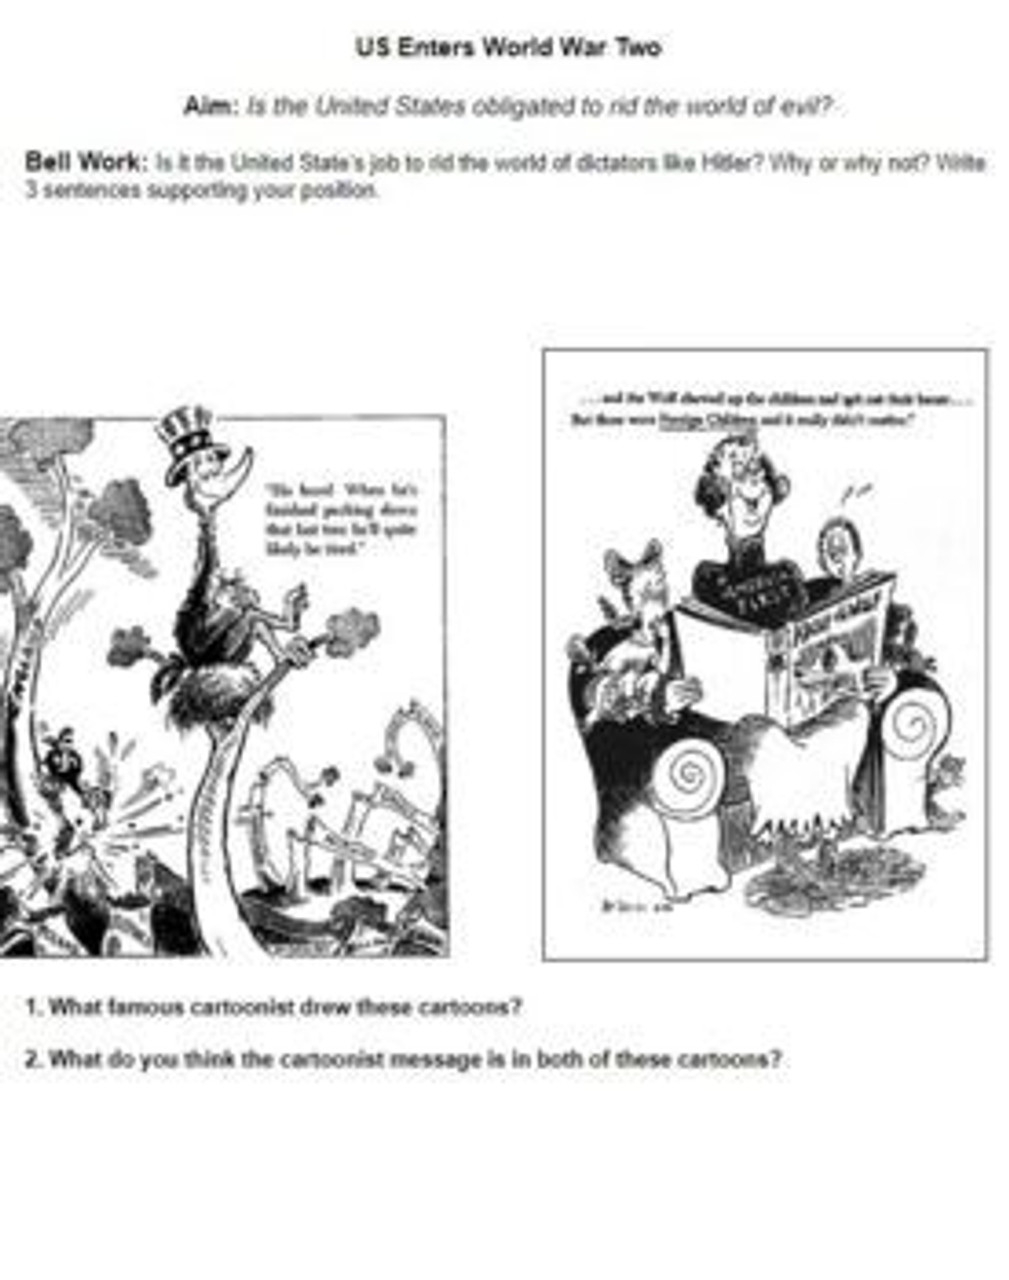 U.S. Enters World War 2: Distance Learning